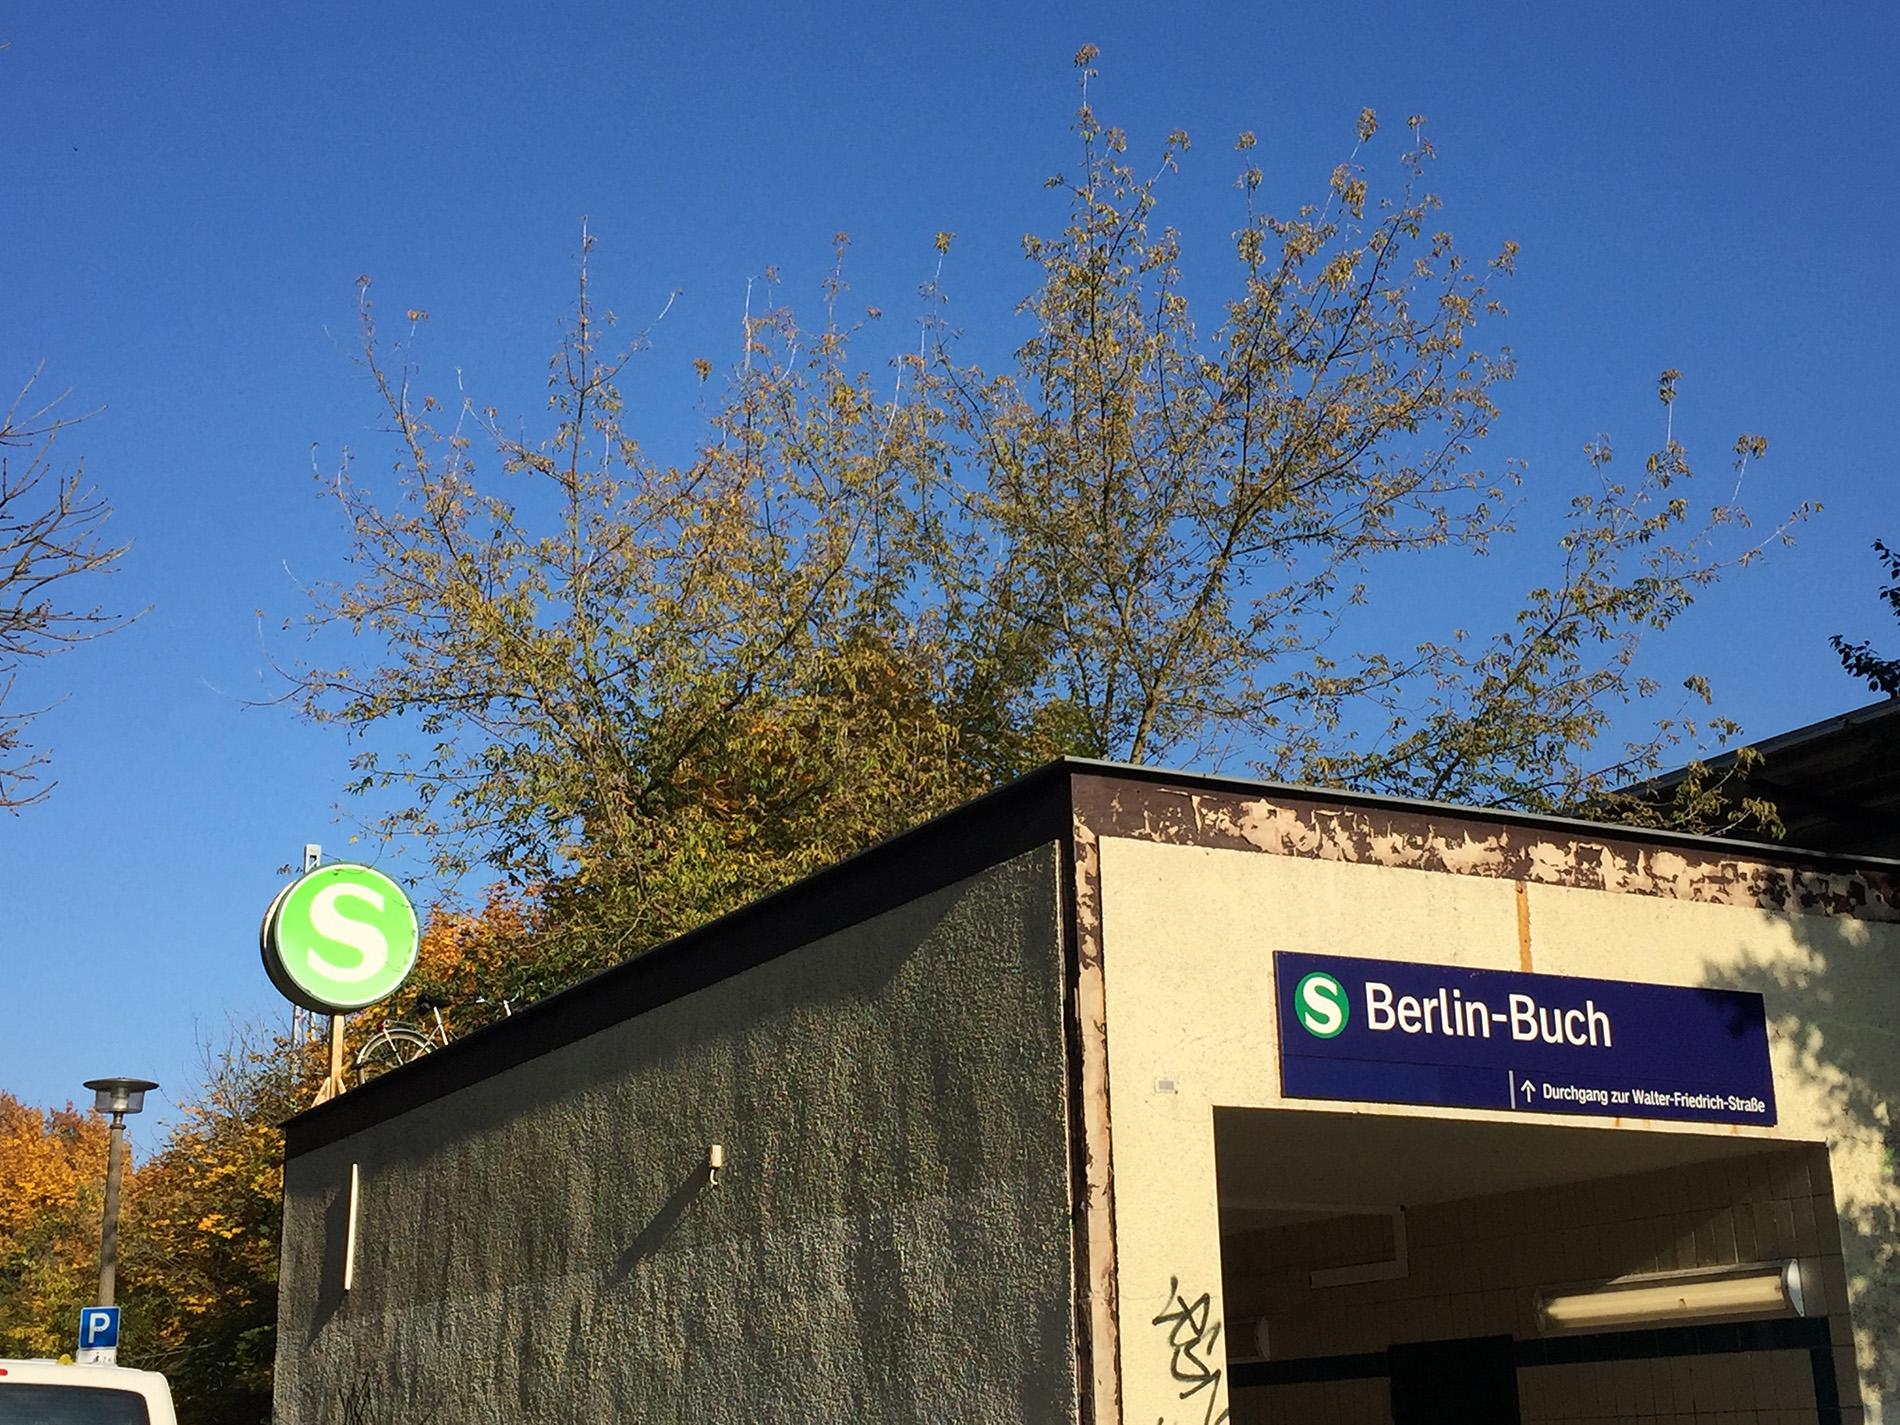 Panke Buch S-Bahn